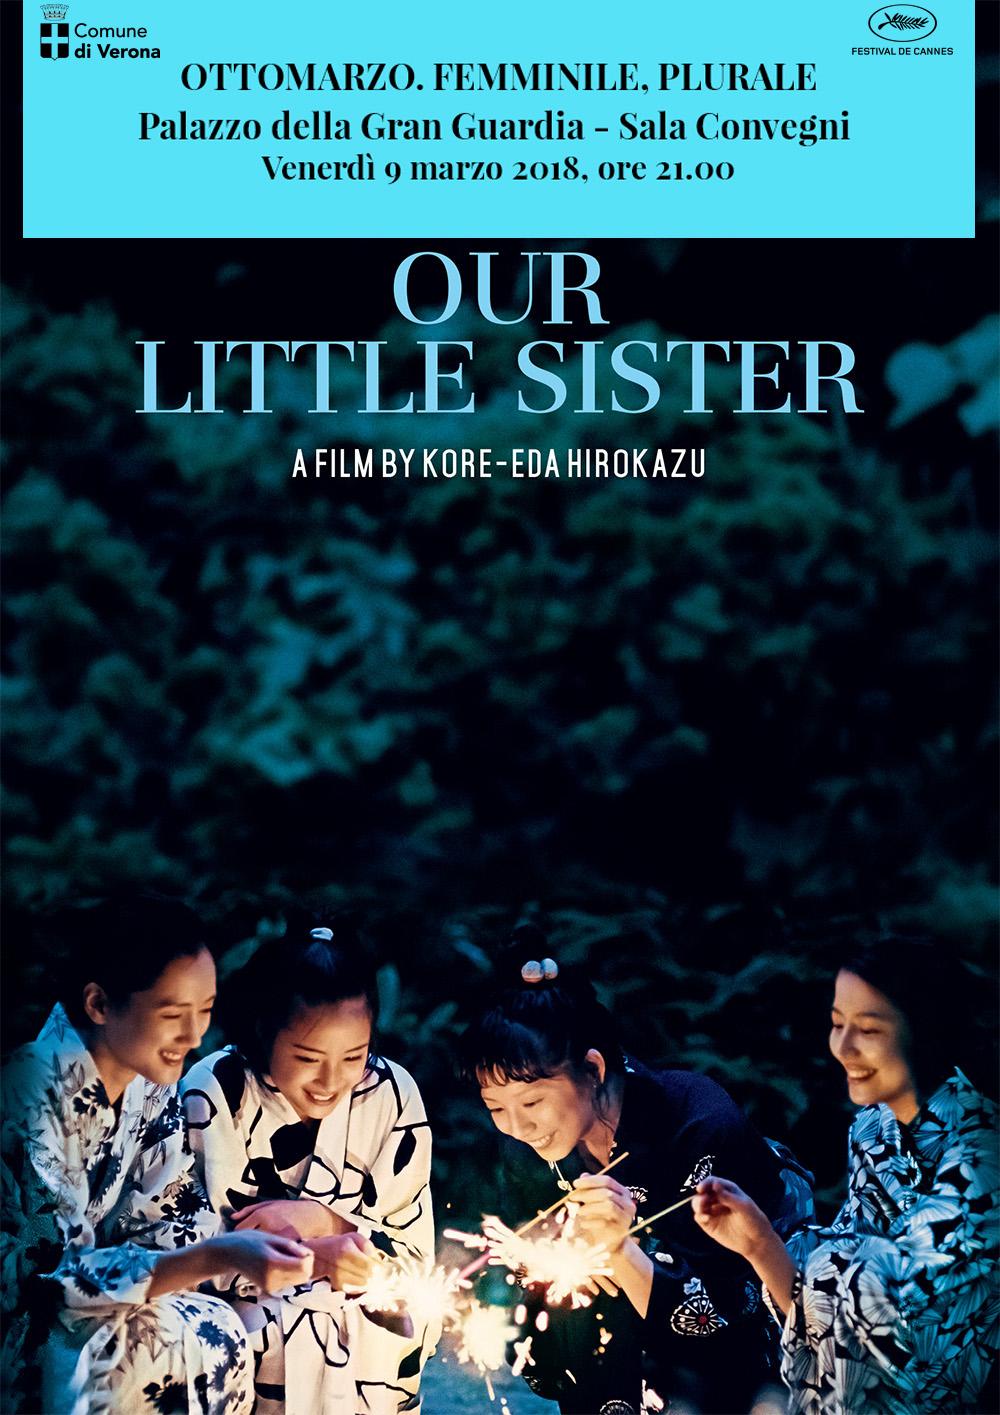 Our Little Sister di Kore'eda Hirokazu